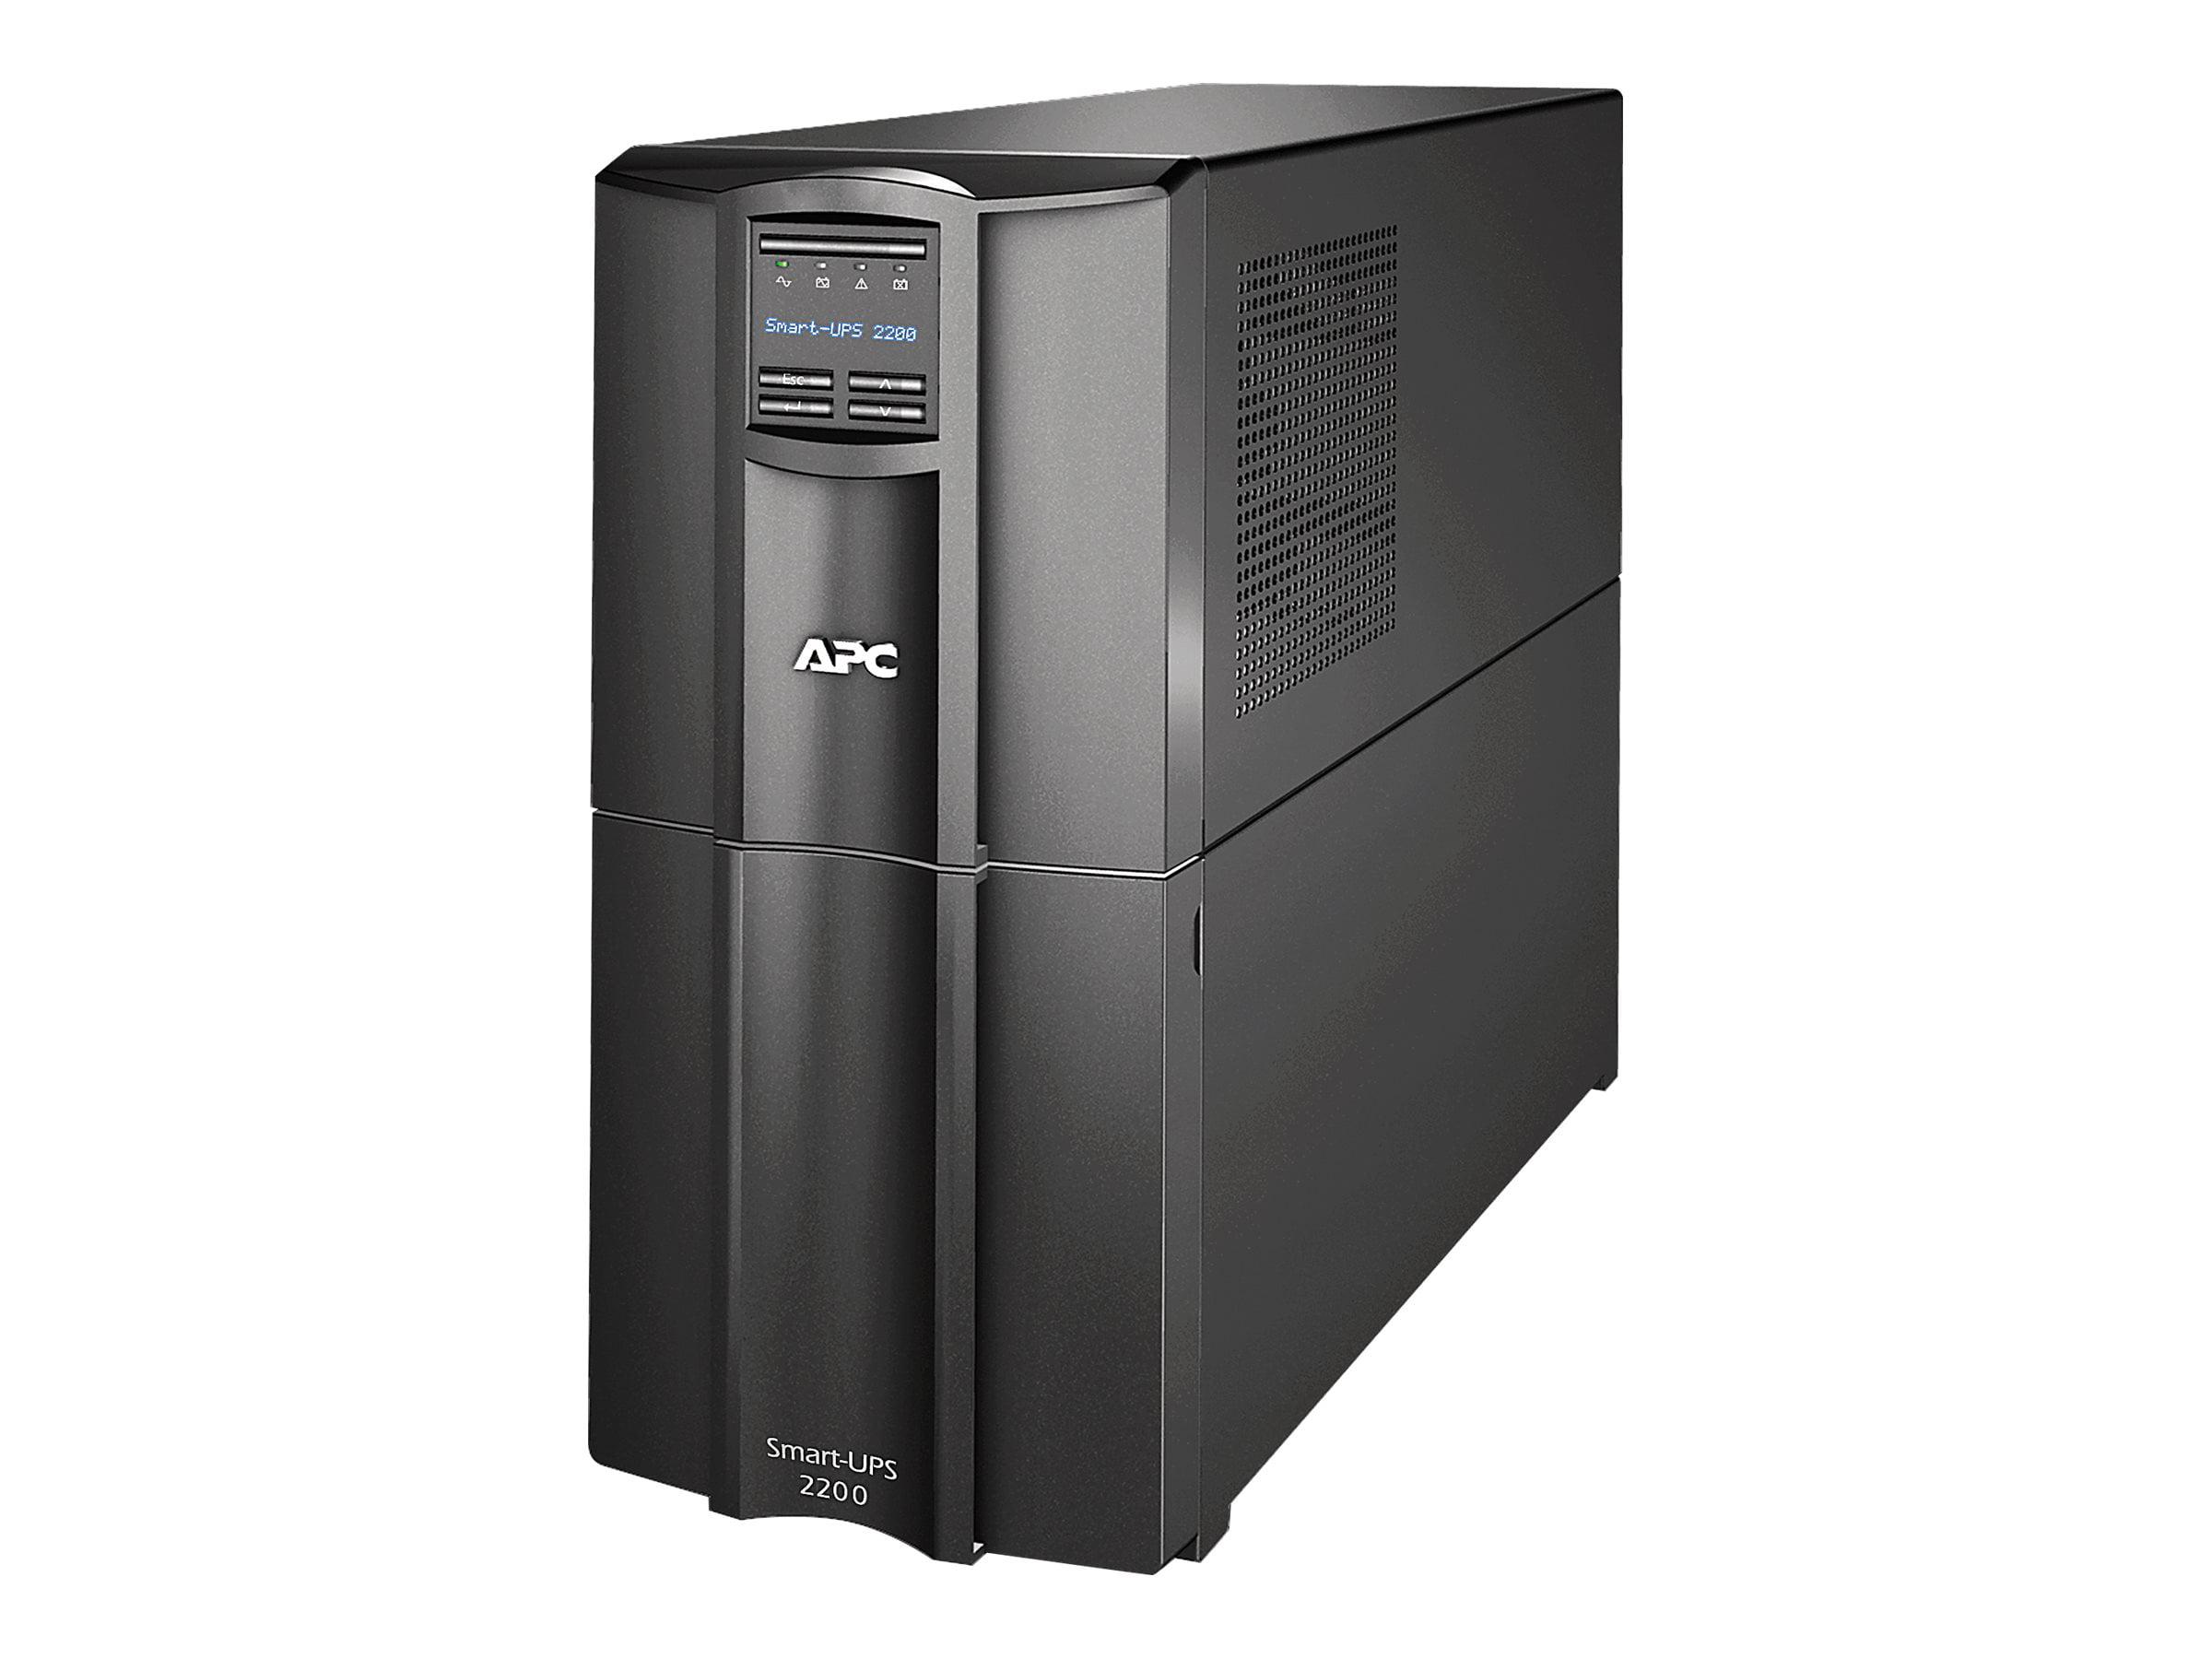 APC Smart-UPS 2200 LCD UPS 1.98 kW 2200 VA by APC